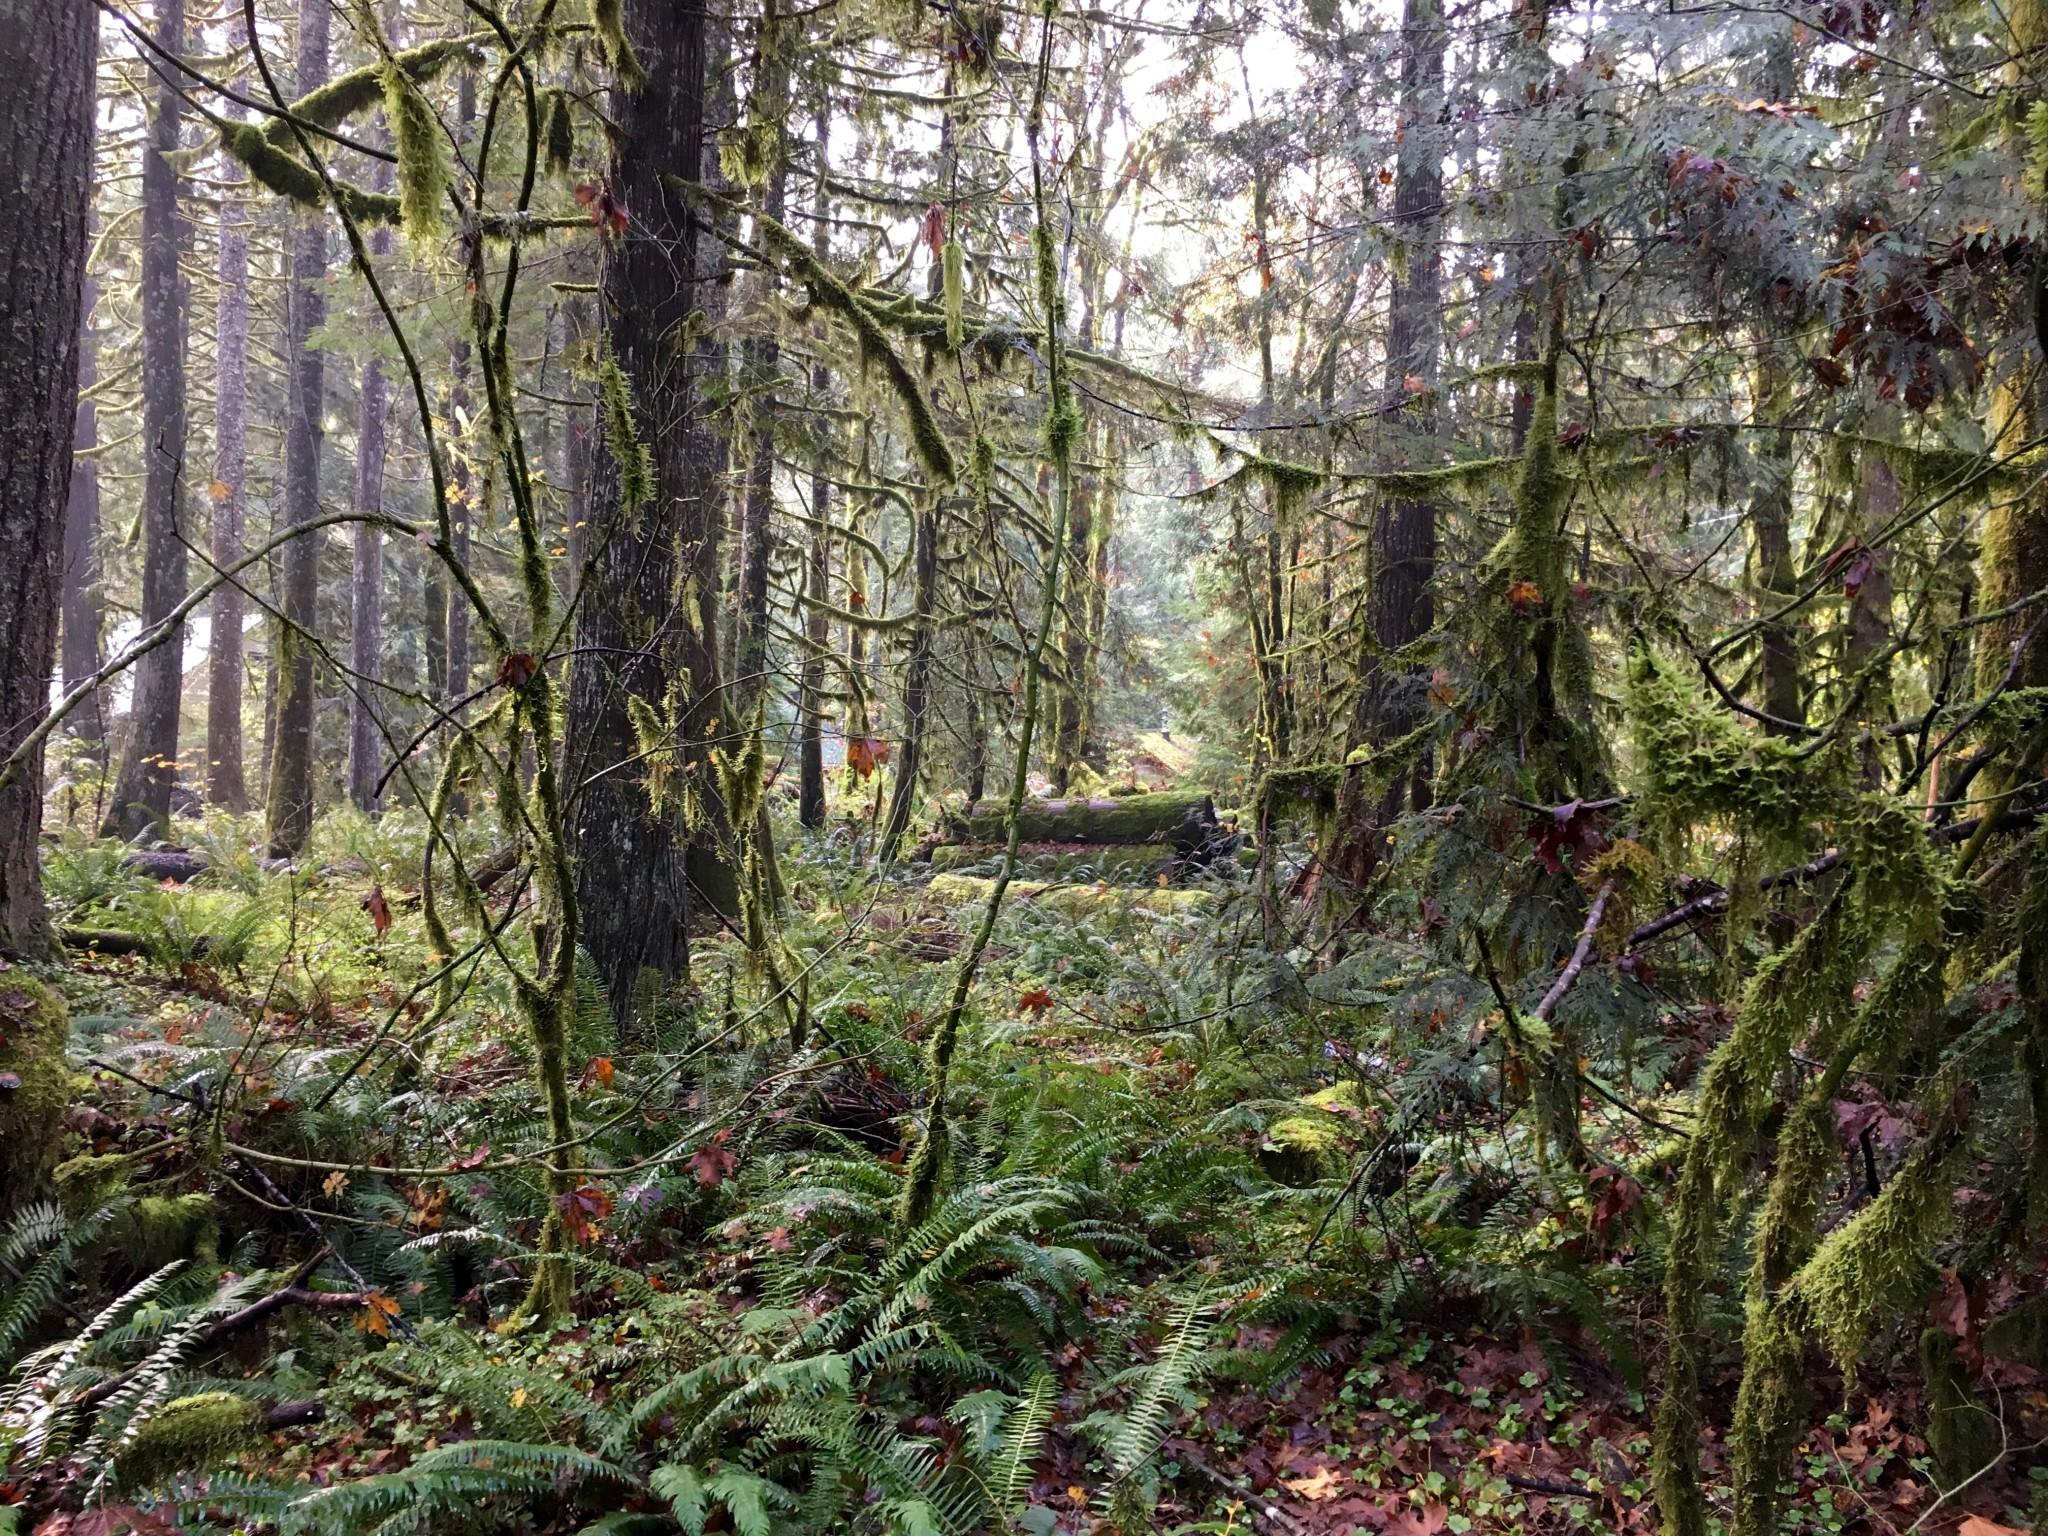 More lovely woods.